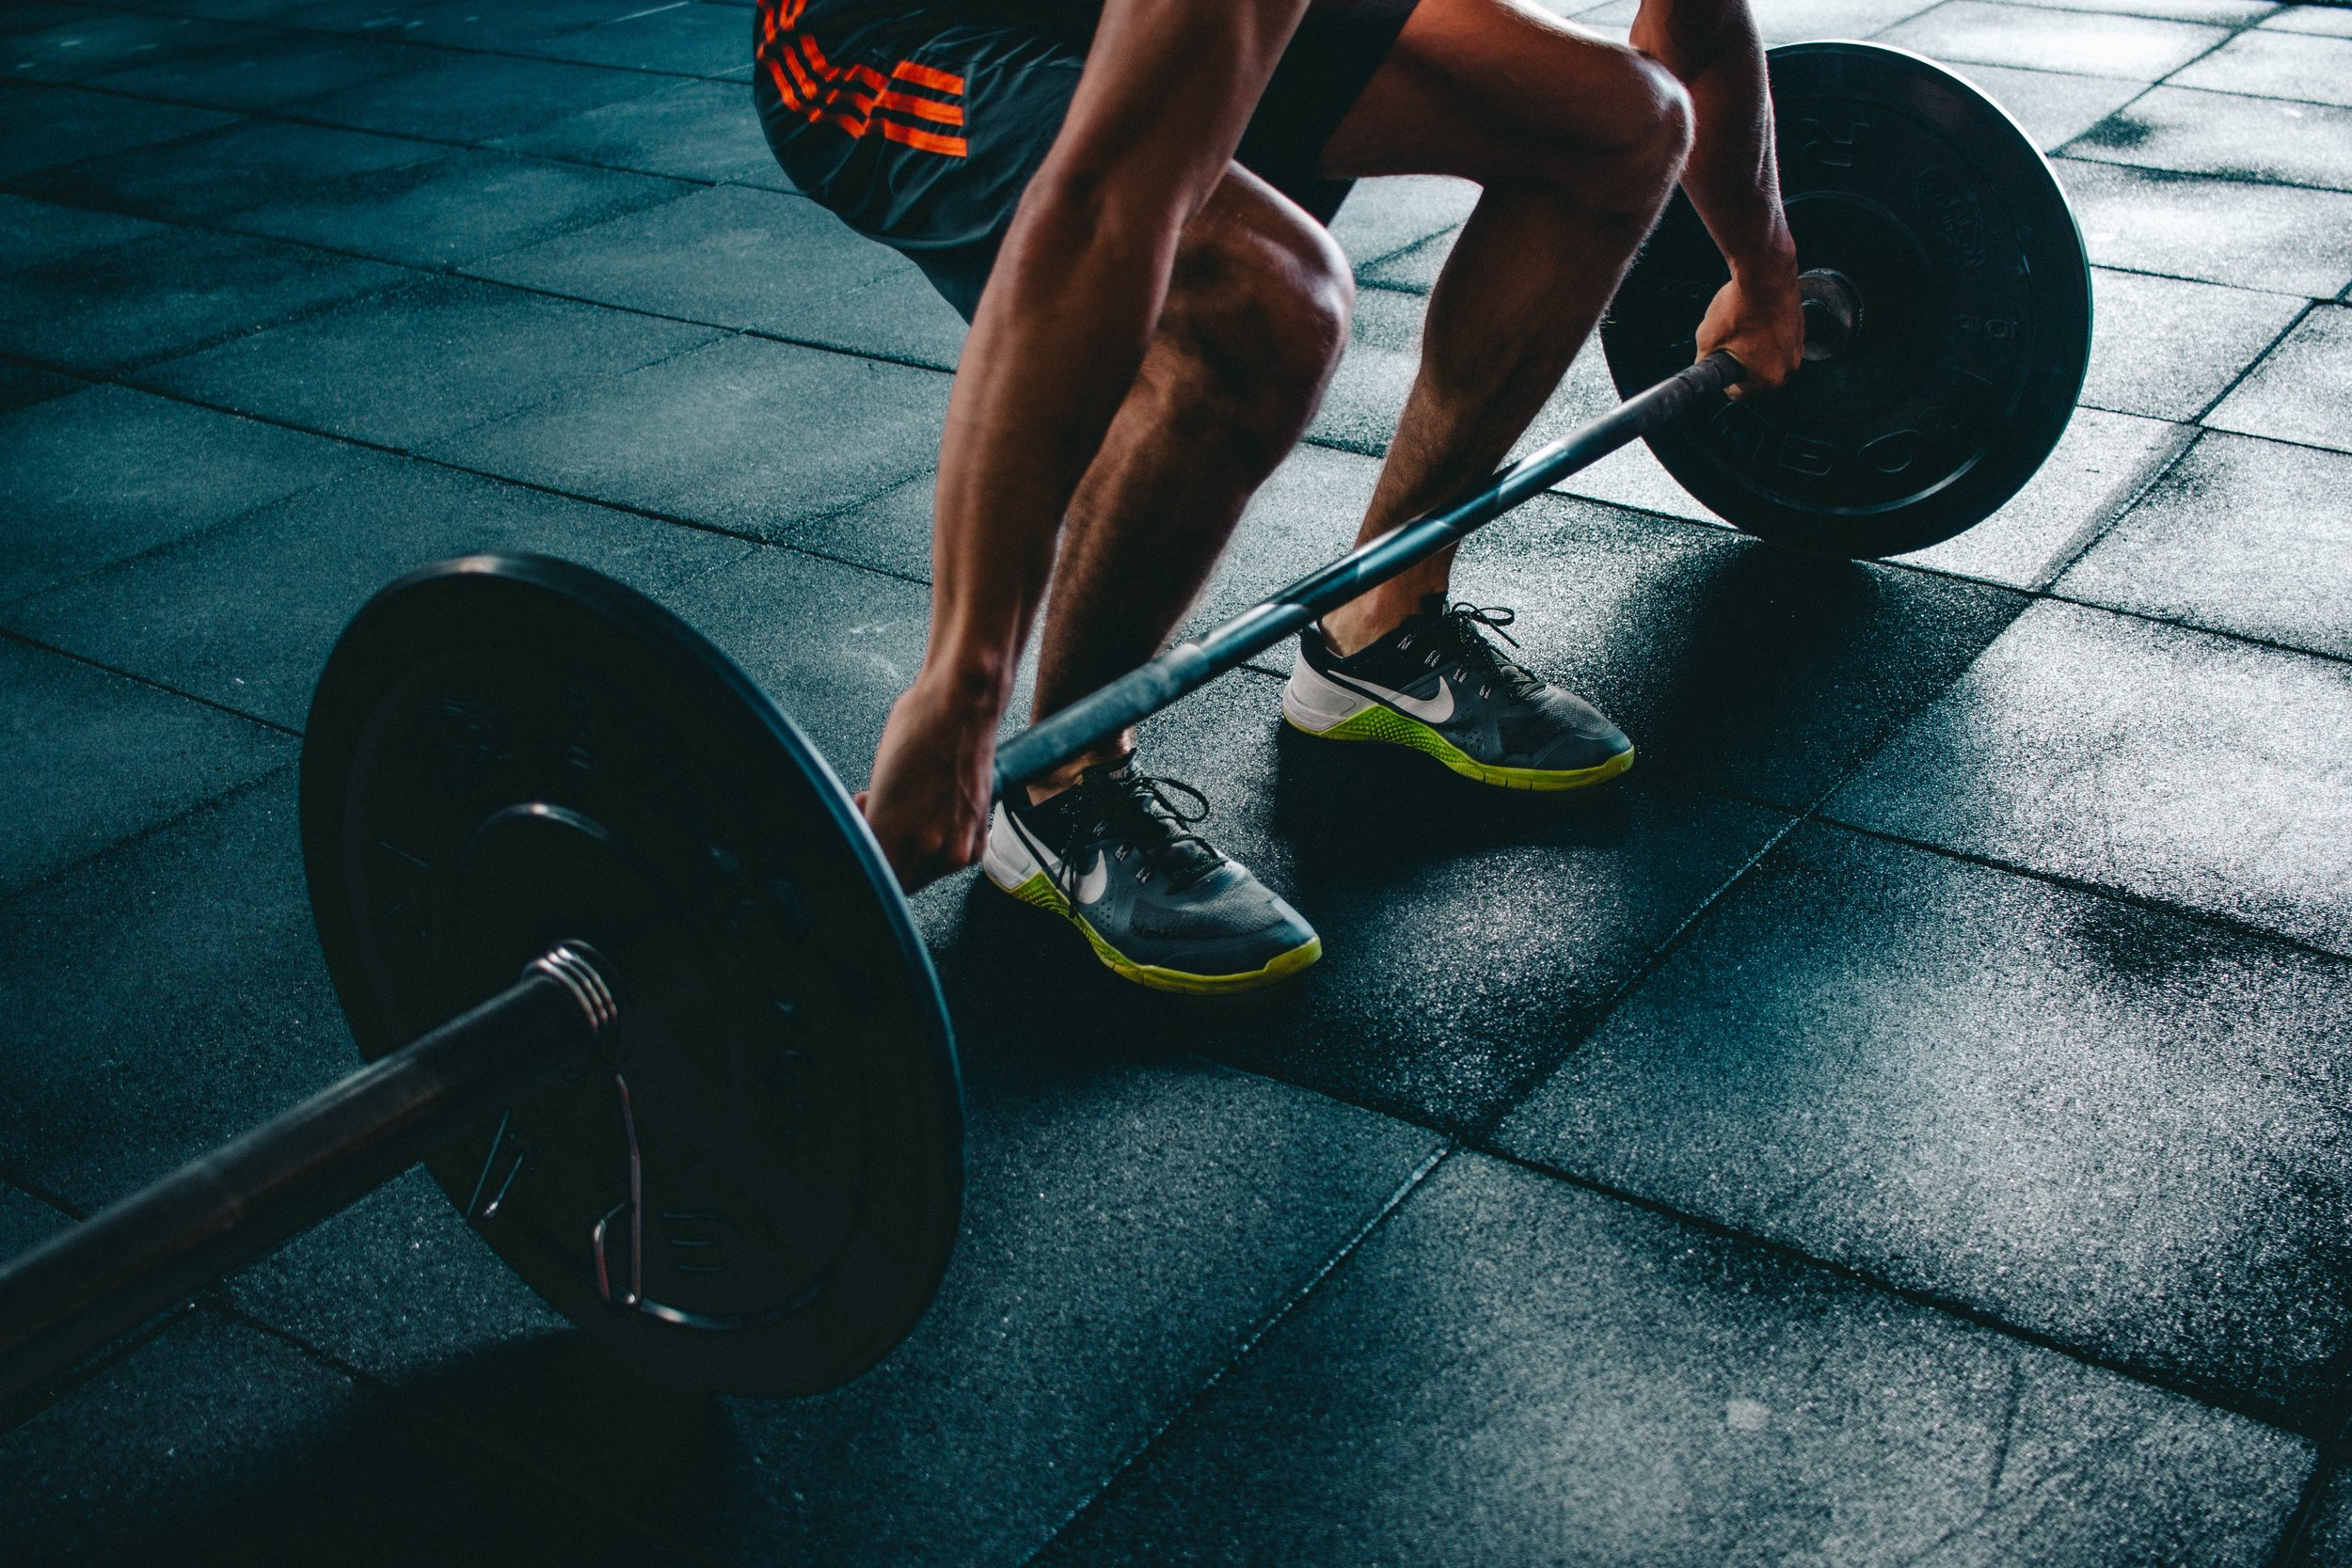 action-athlete-barbell-841130.jpg